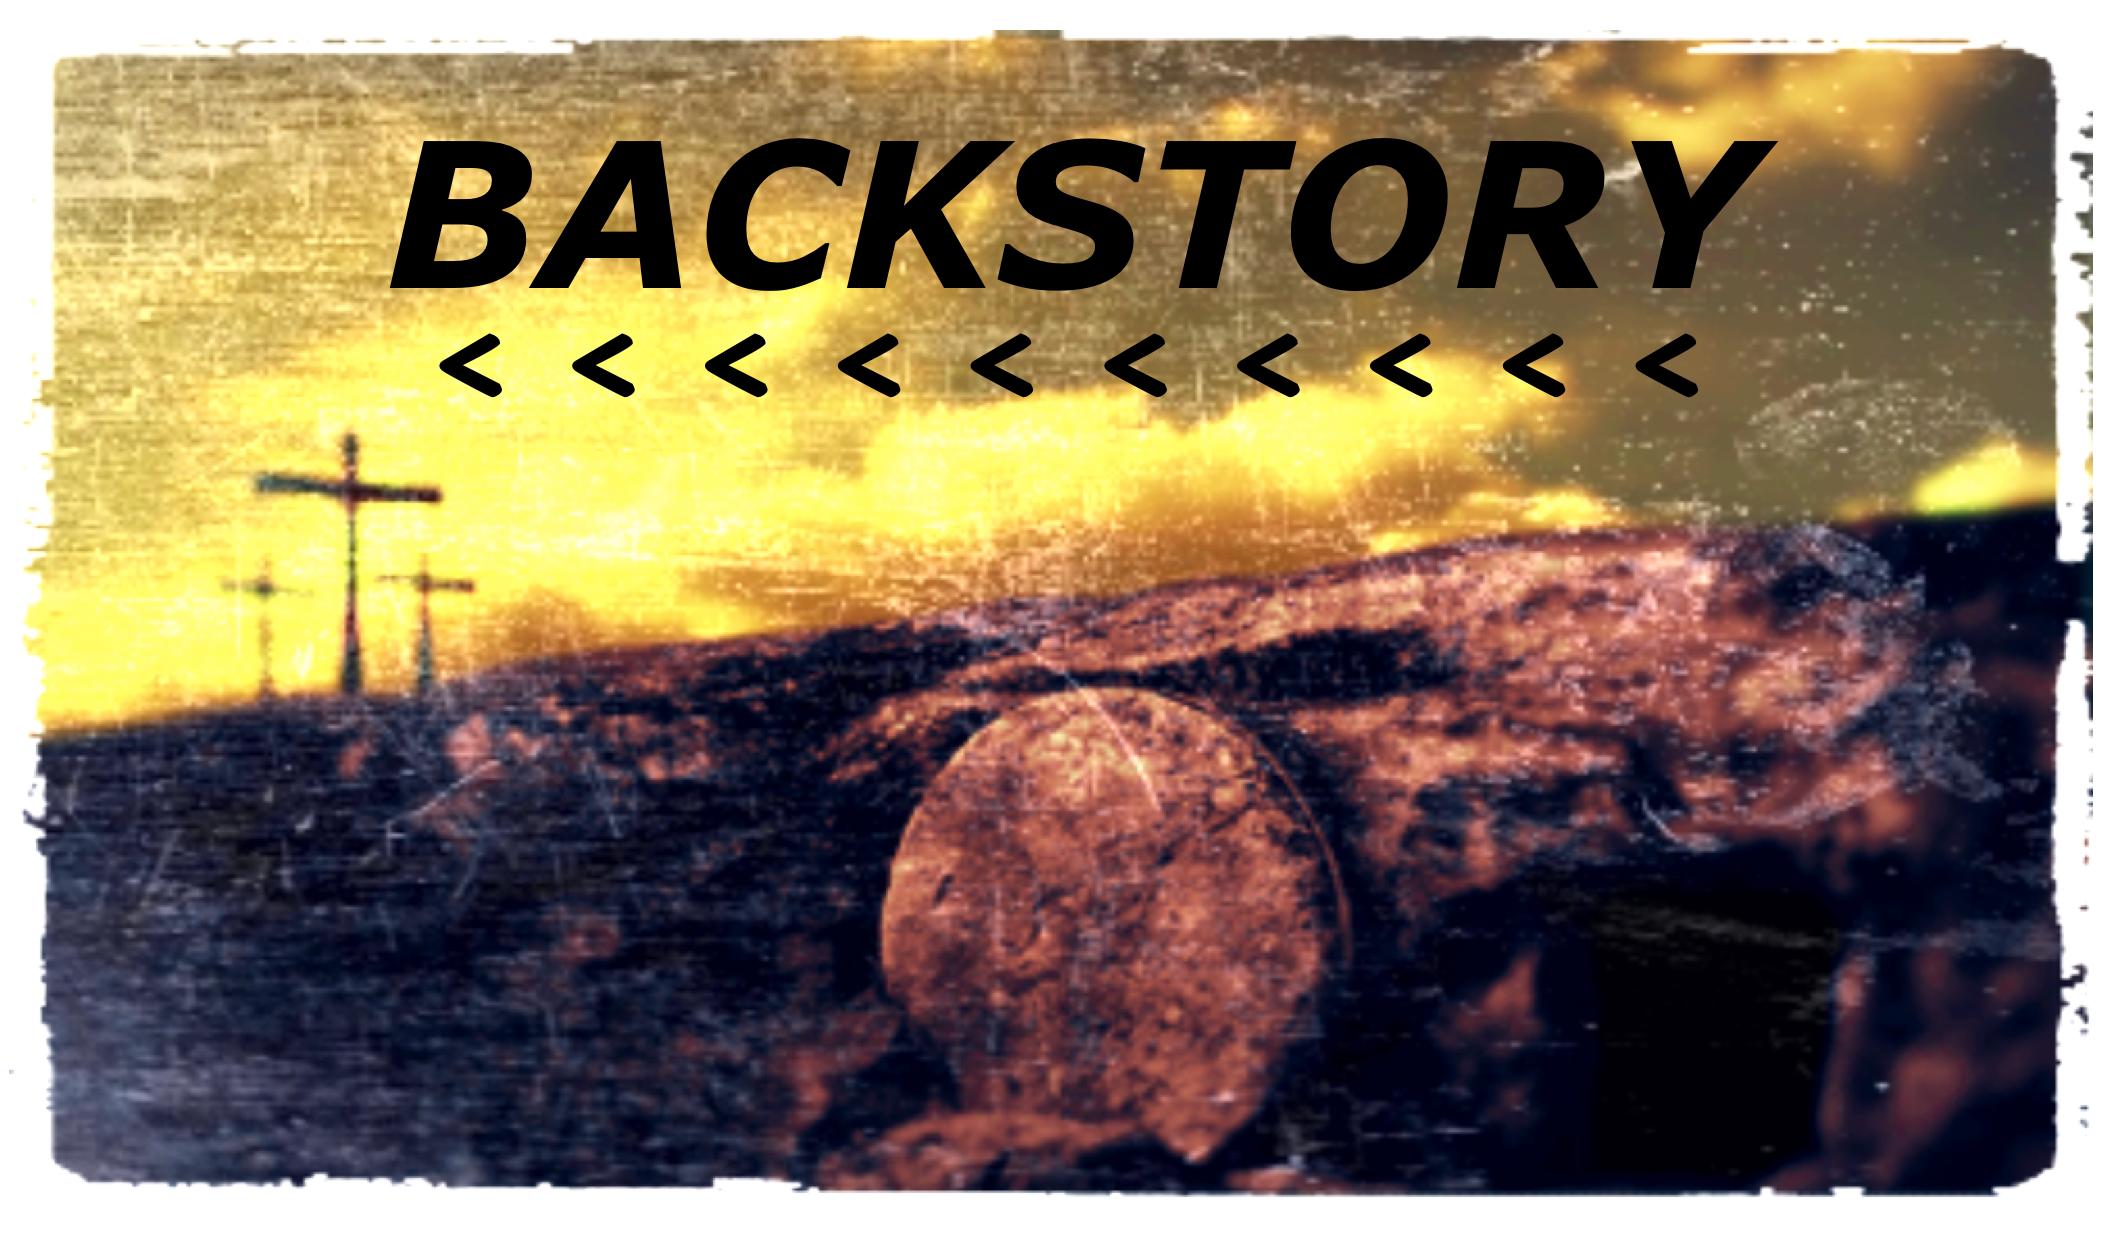 Backstory.png